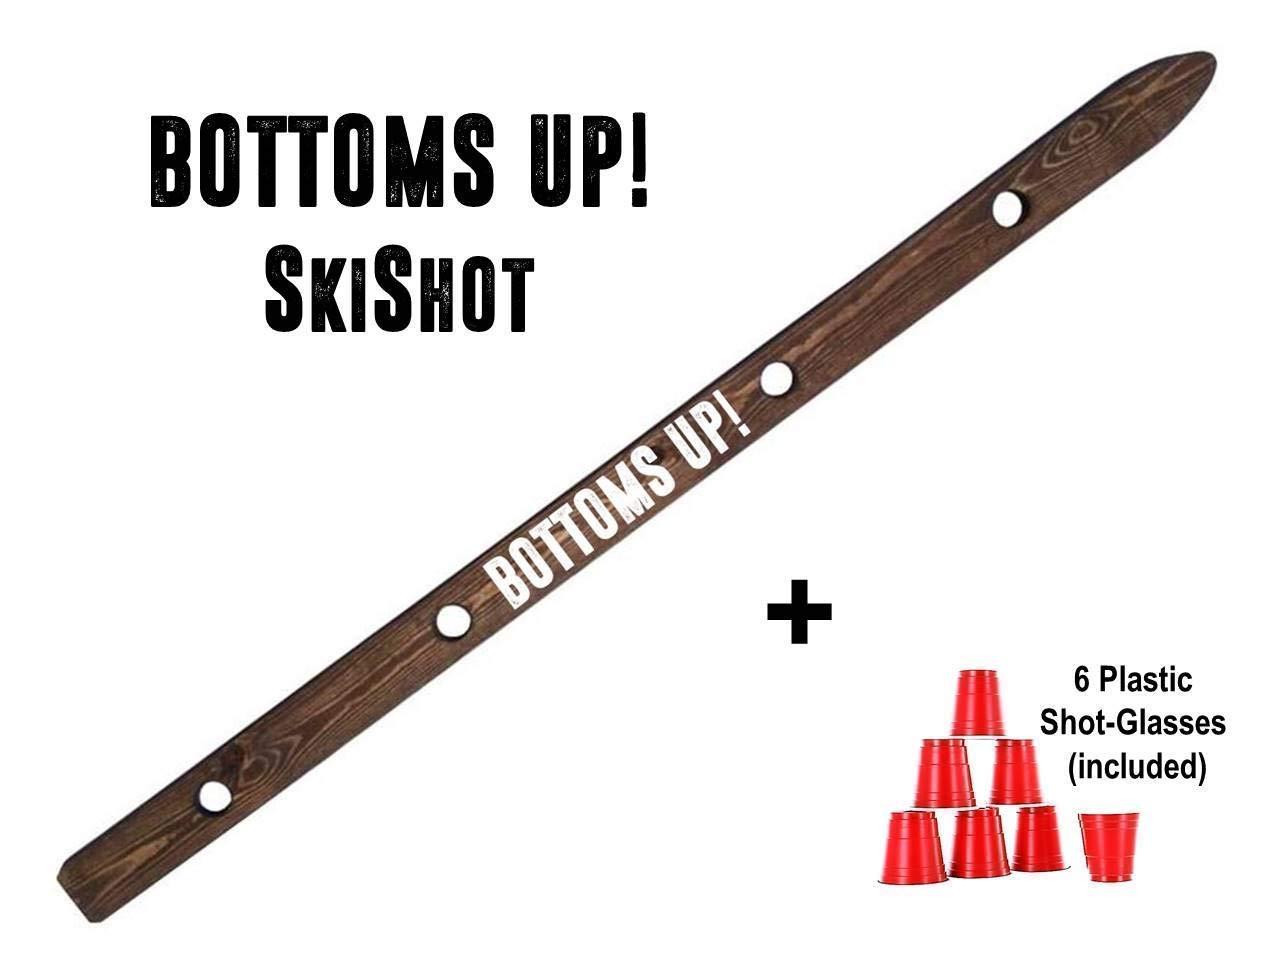 Bottoms Up Shot Board Wooden Ski